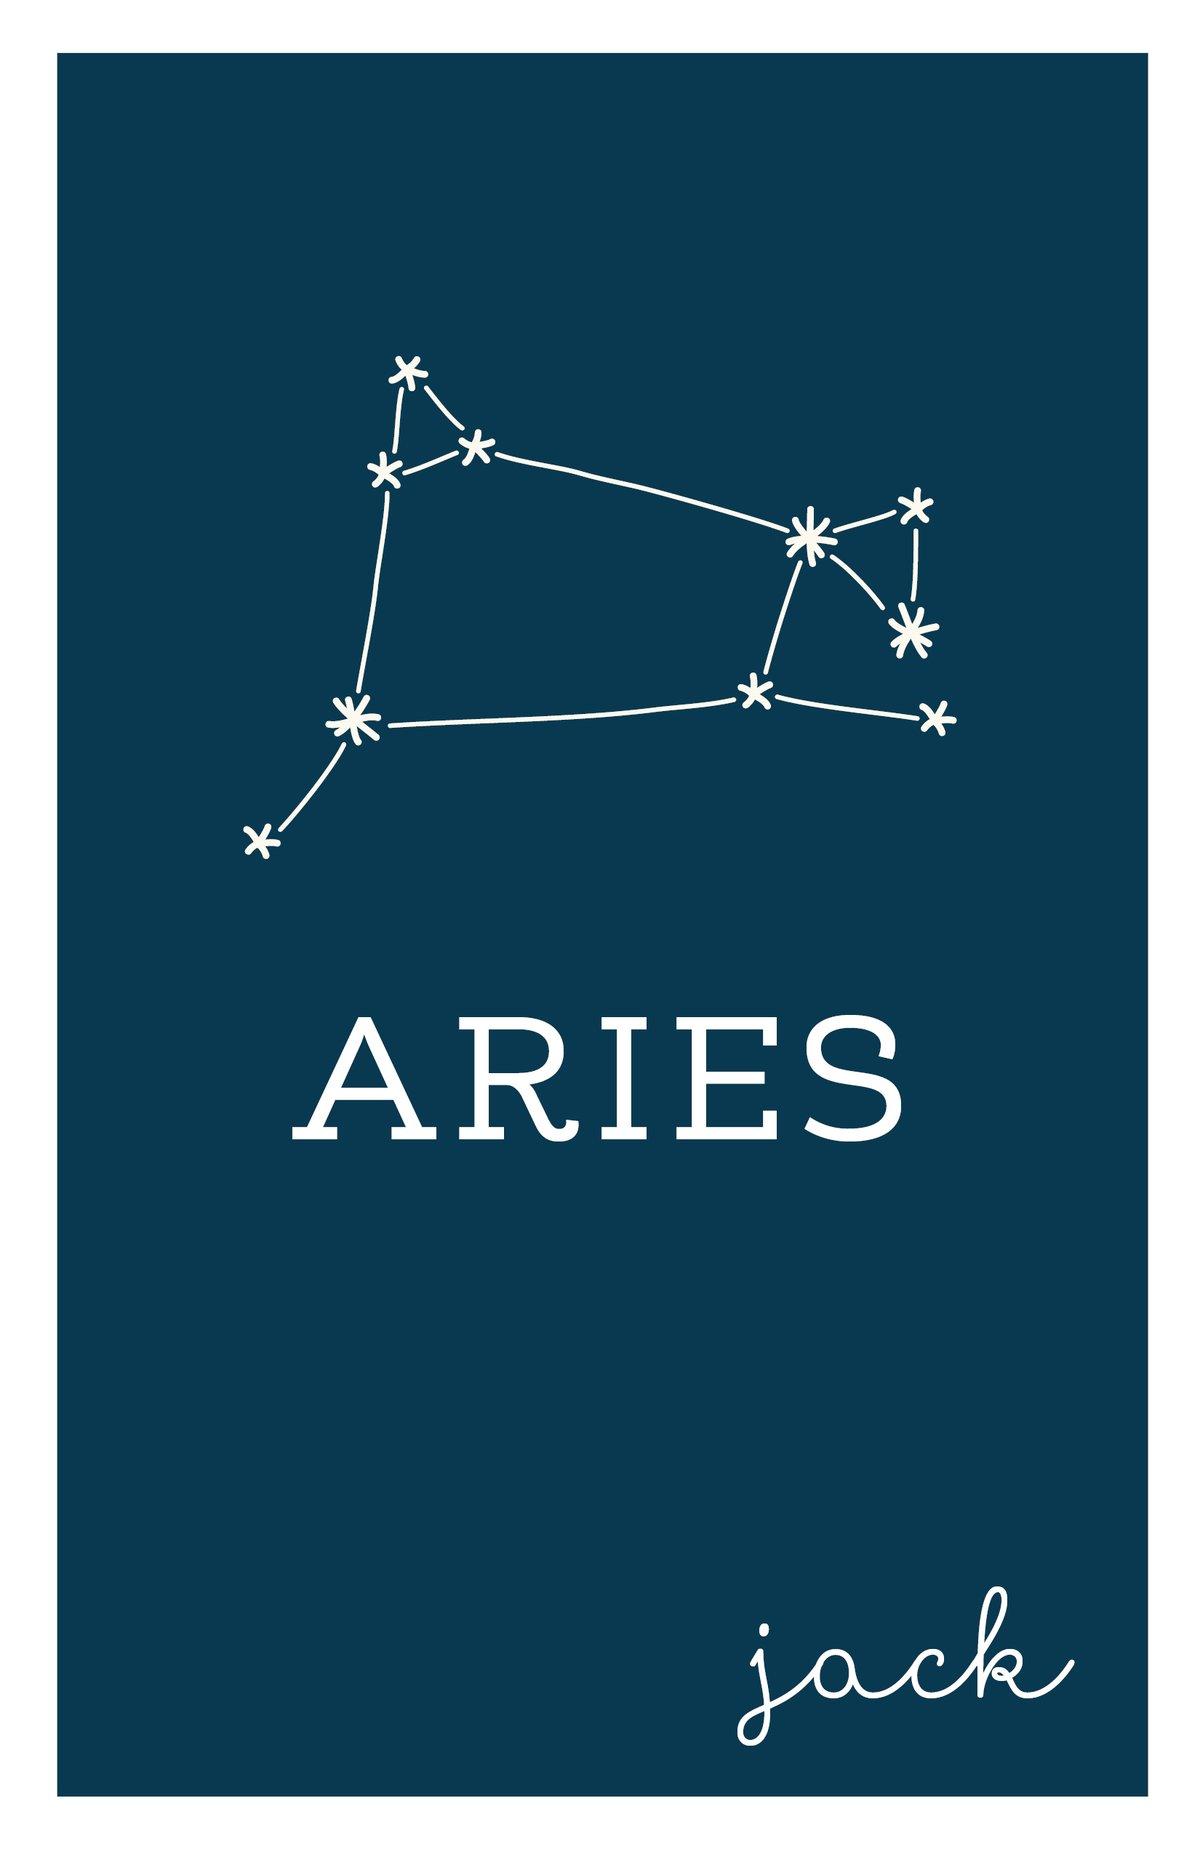 Zodiac Constellation Prints